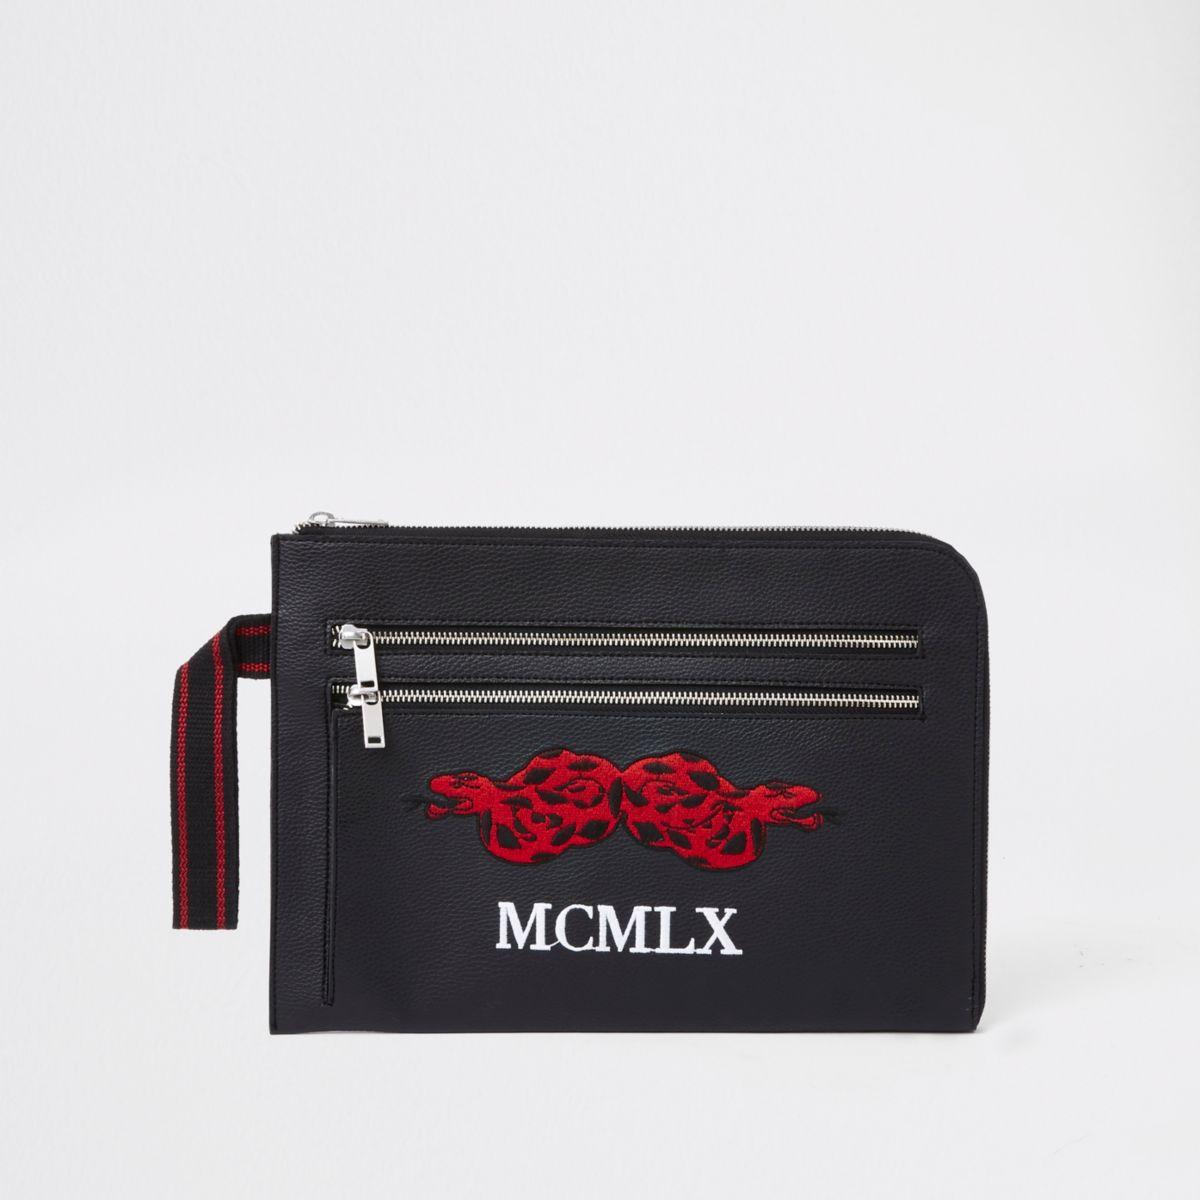 Black' MCMLX' snake embroidered portfolio bag